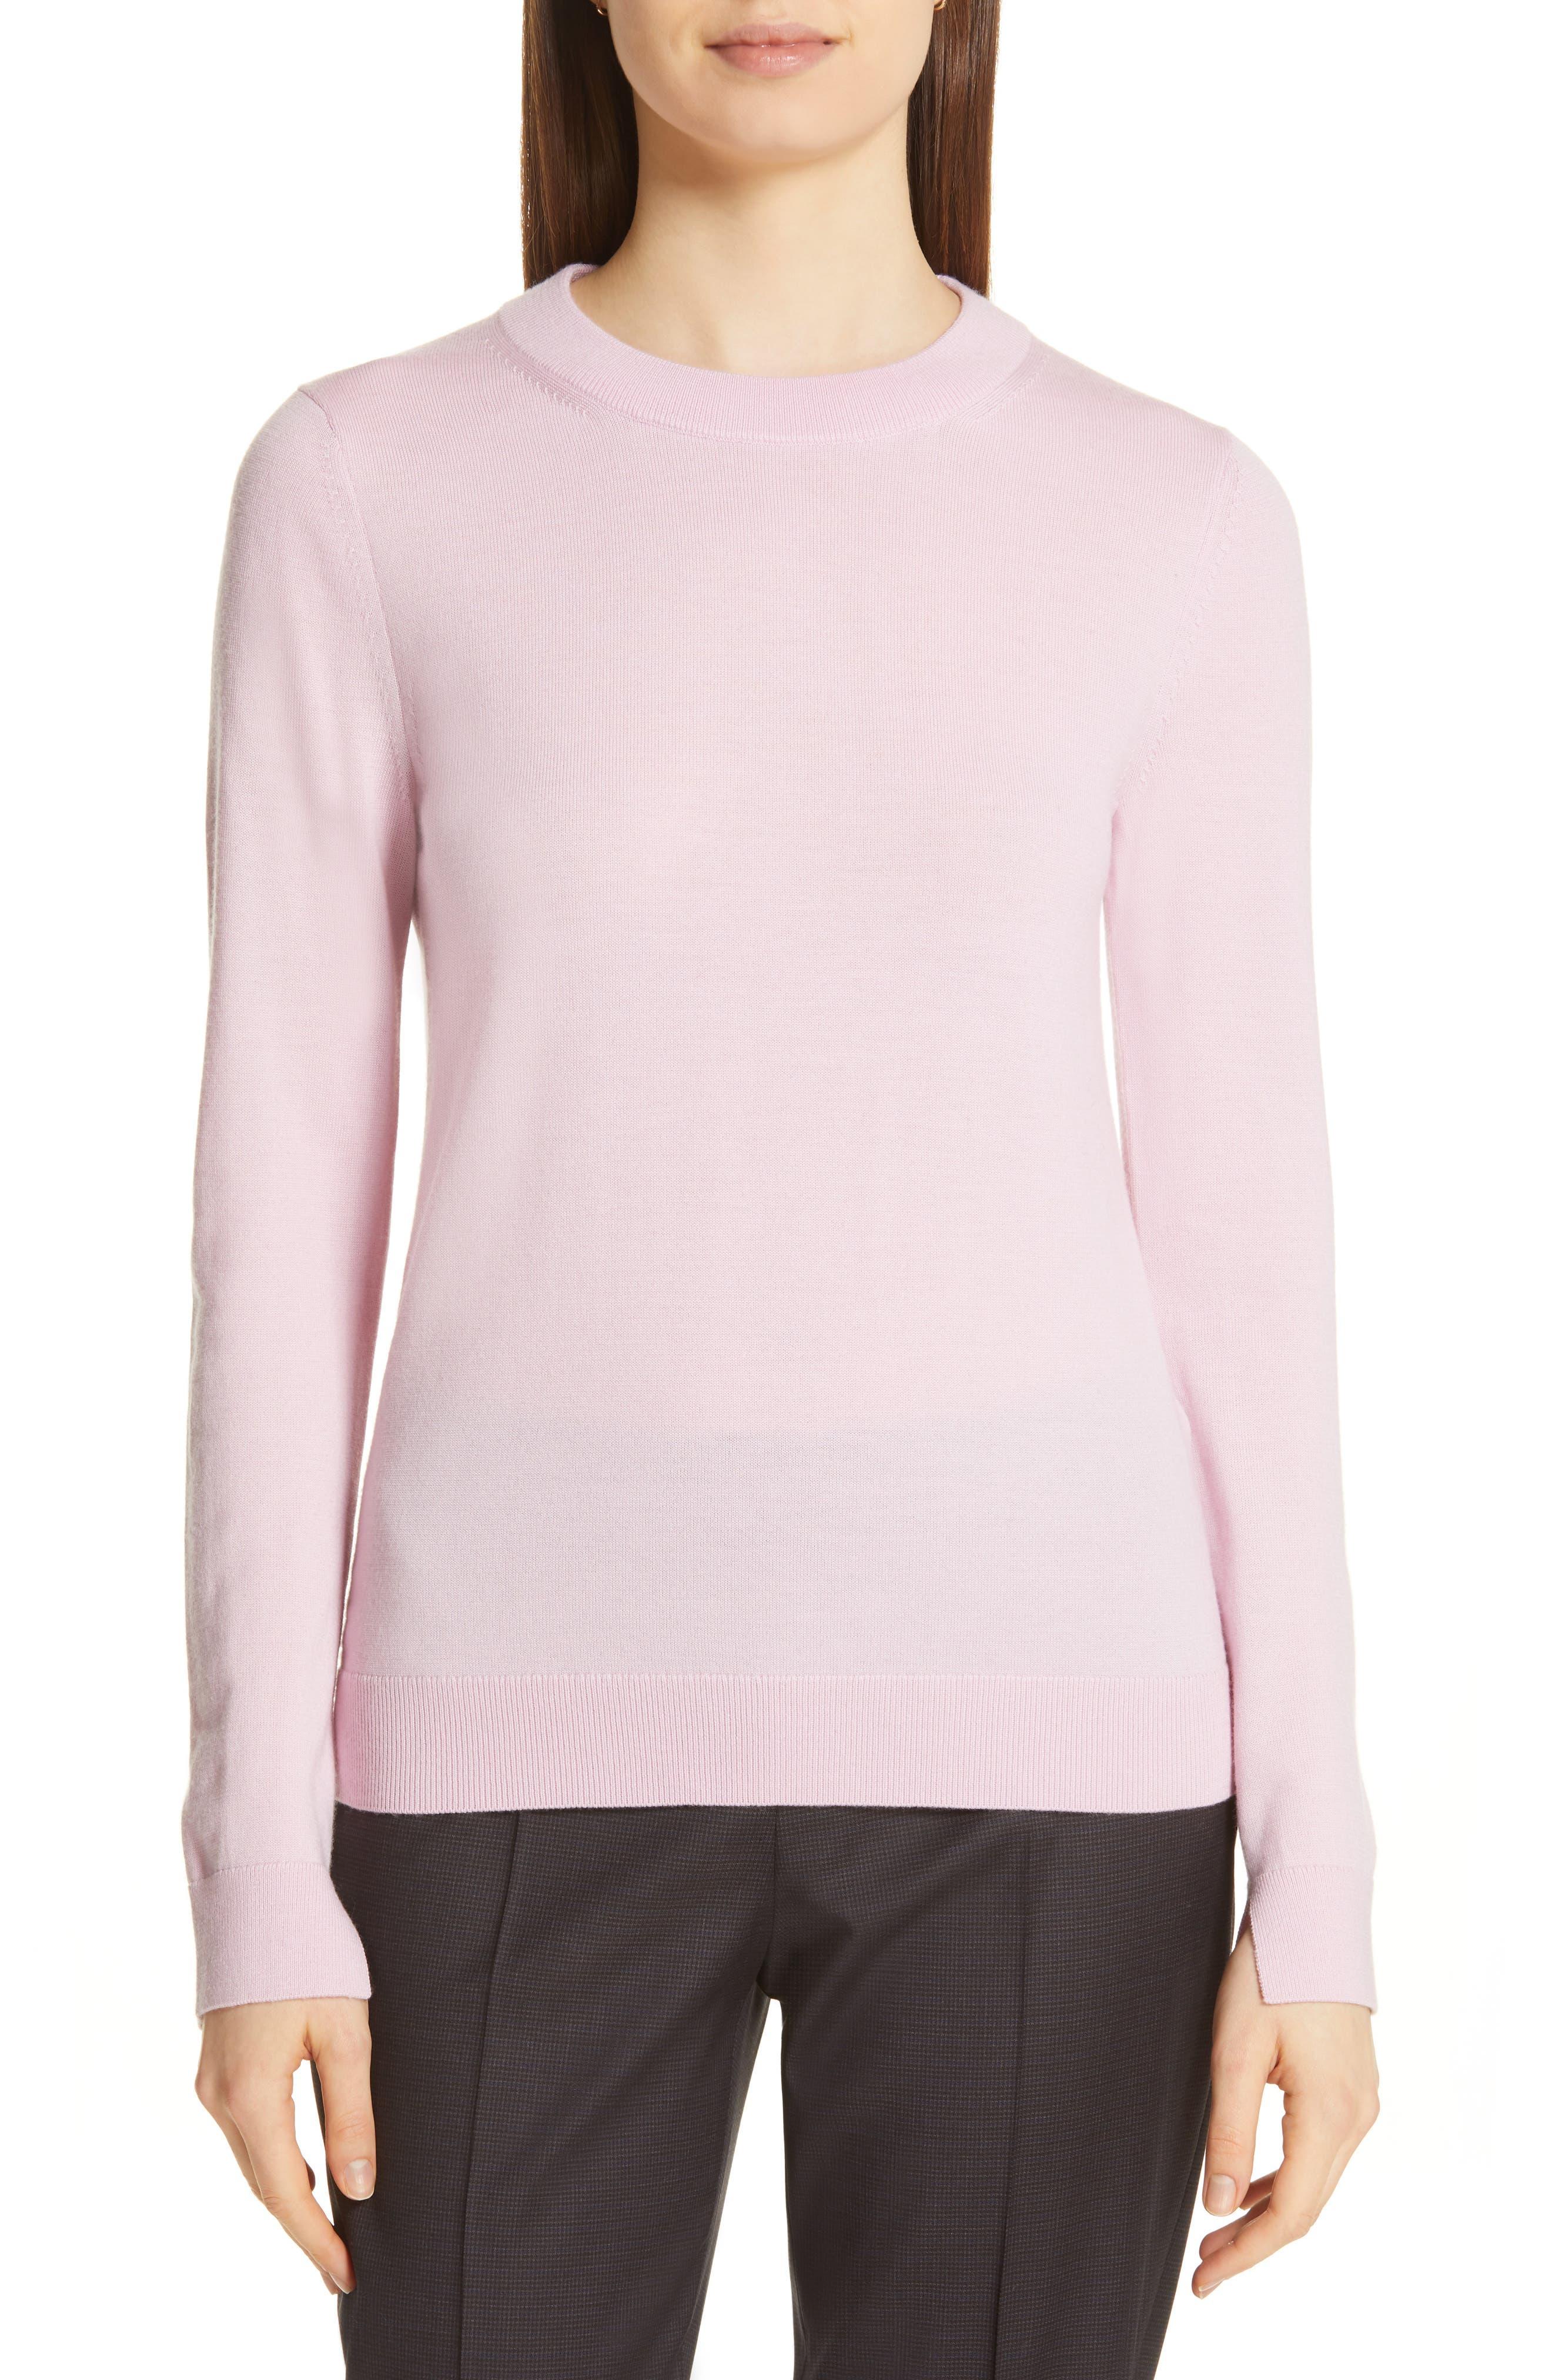 Boss Fegan Merino Wool Knit Sweater, Pink